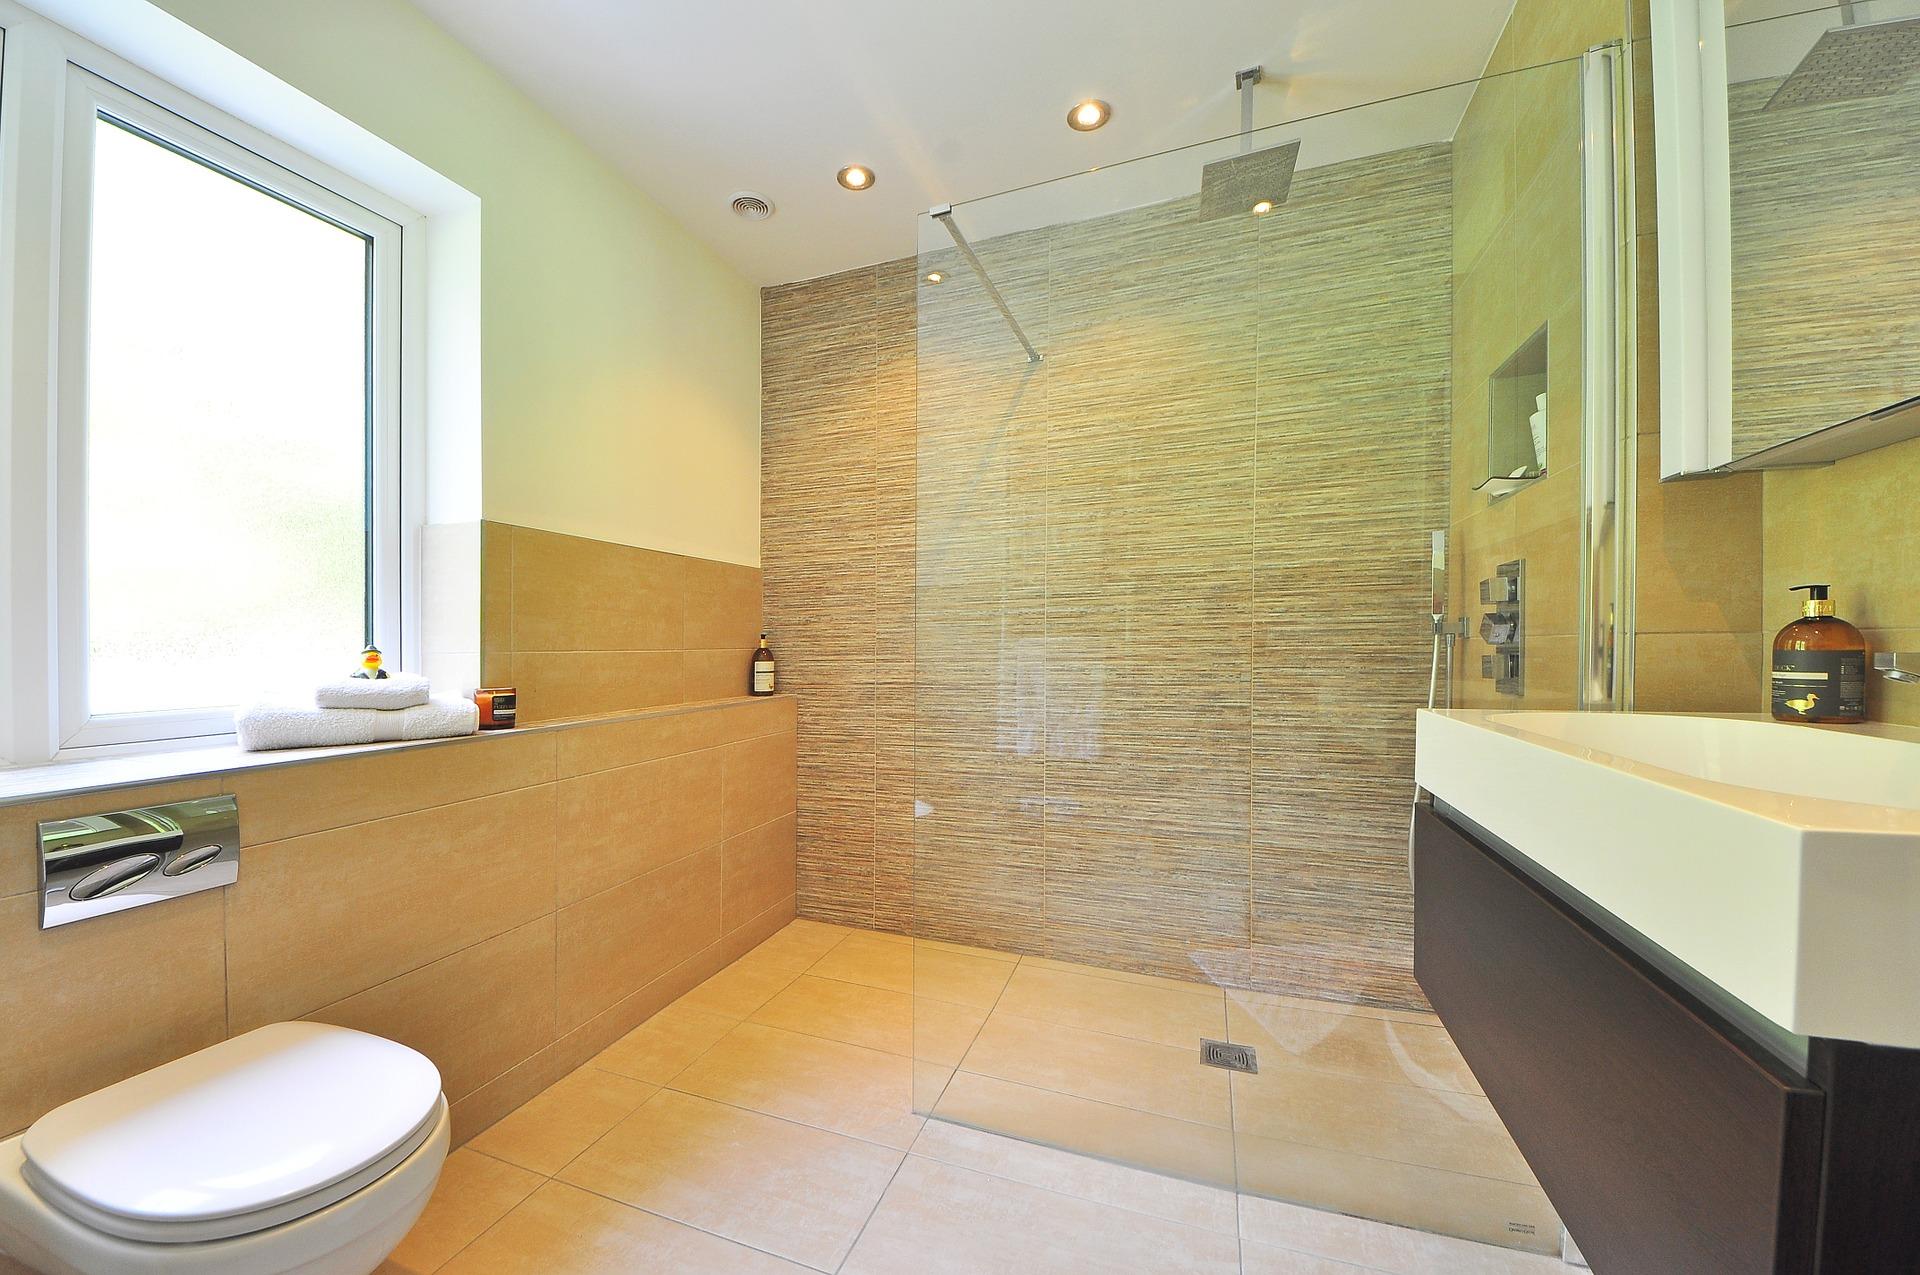 Lighting Hacks Proper Lighting Tips To Spruce Up Your Bathroom